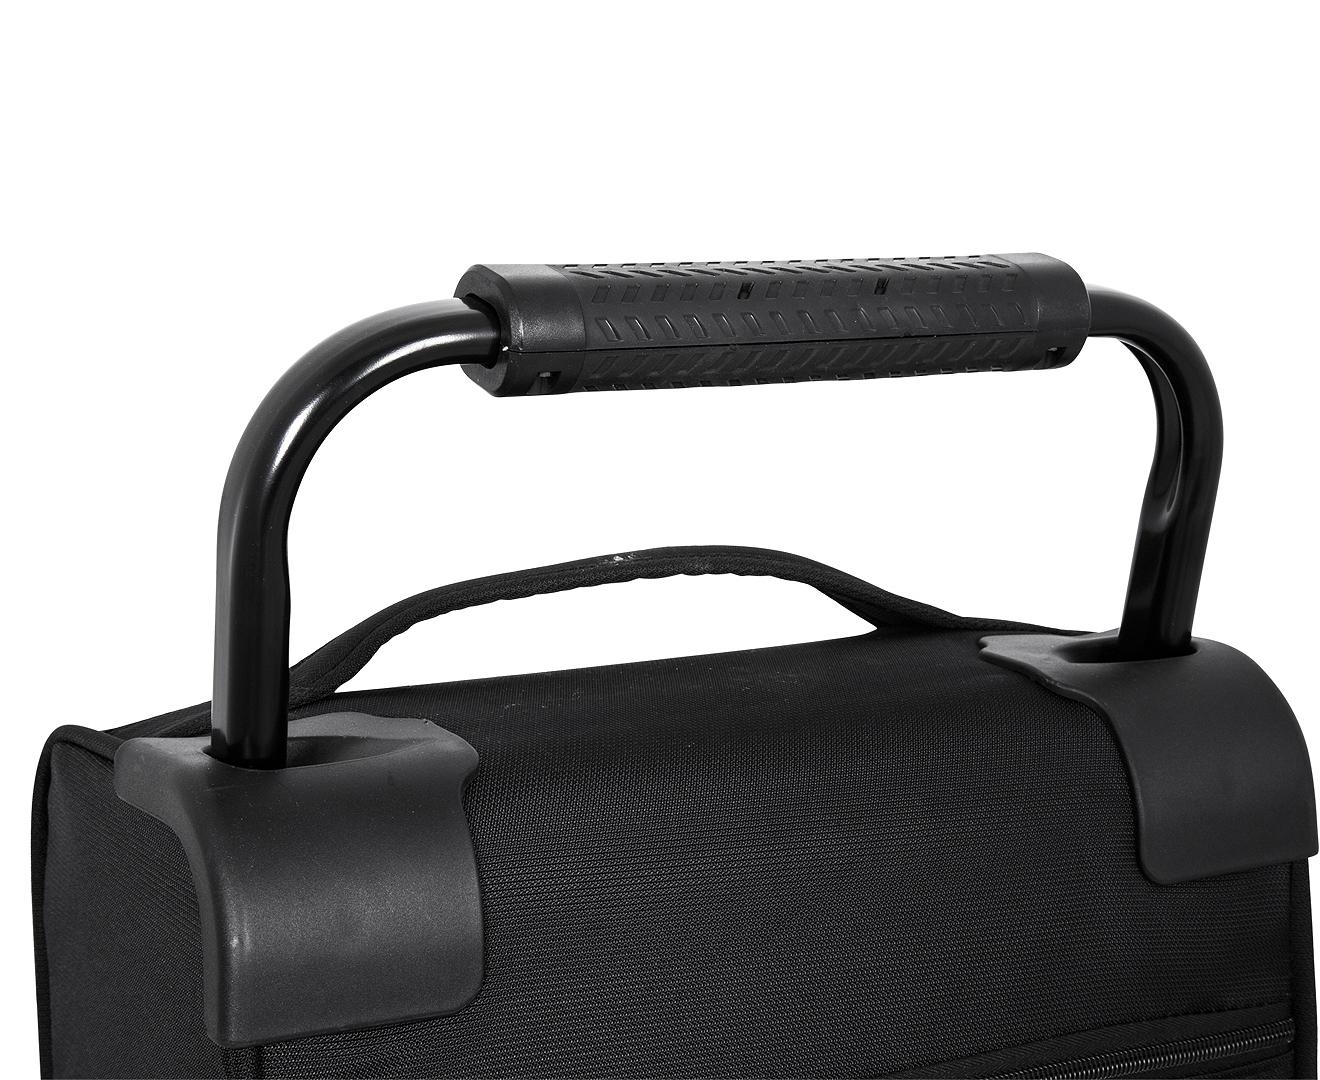 3880c8a50 ZFrame Super Lightweight 3-Piece 8W Suitcase Set - Black | Catch.com.au